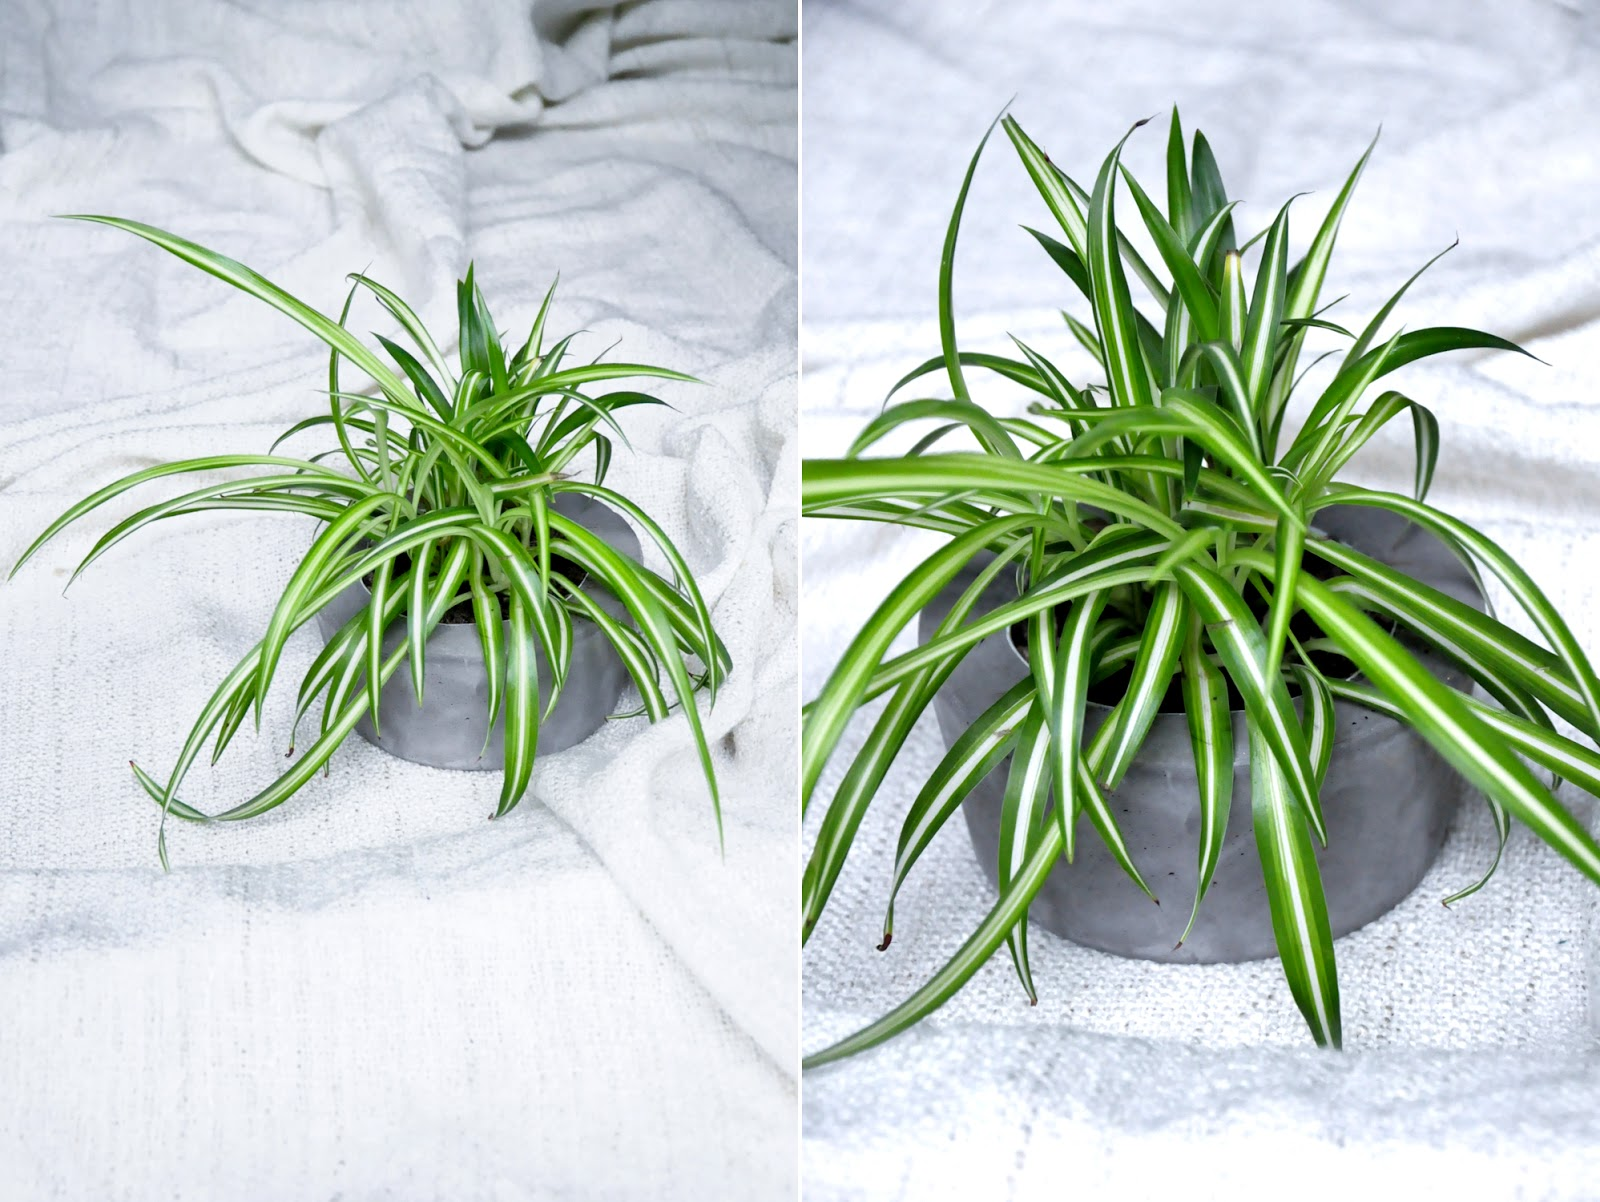 https://blogdogdaysofsummer.blogspot.co.at/2015/05/diy-conrete-planter.html?showComment=1433058768099#c7199877709550843465